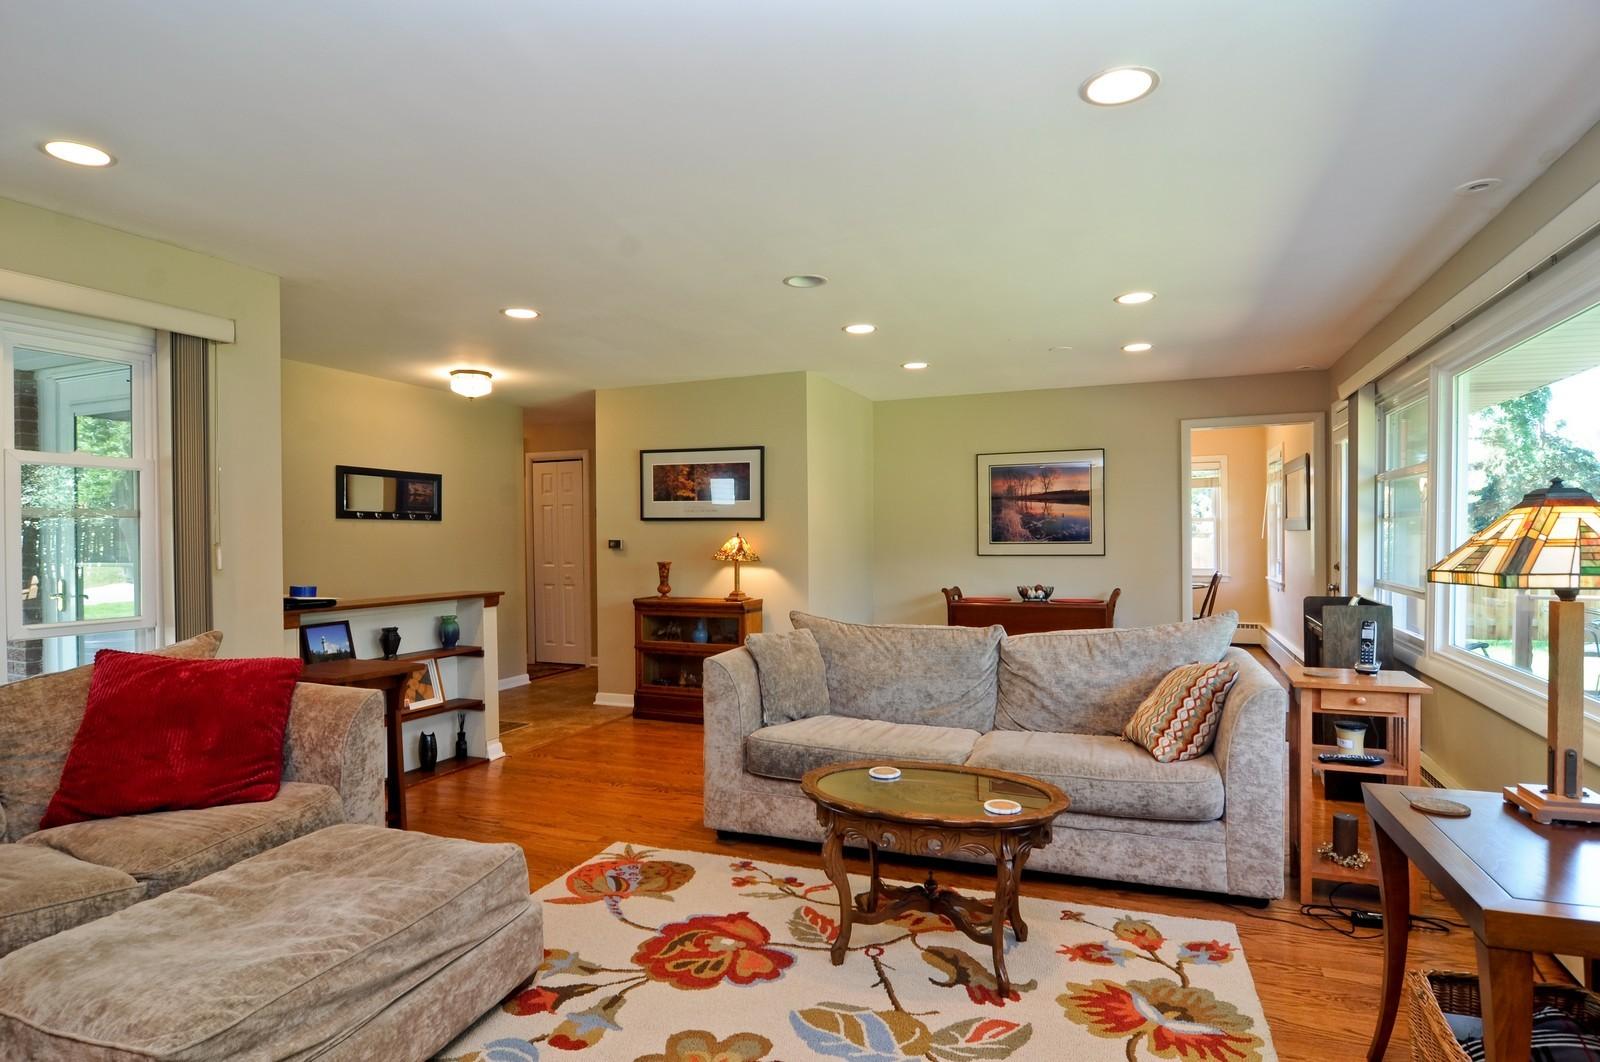 Real Estate Photography - 240 Sharon Dr, Barrington, IL, 60010 - Location 2